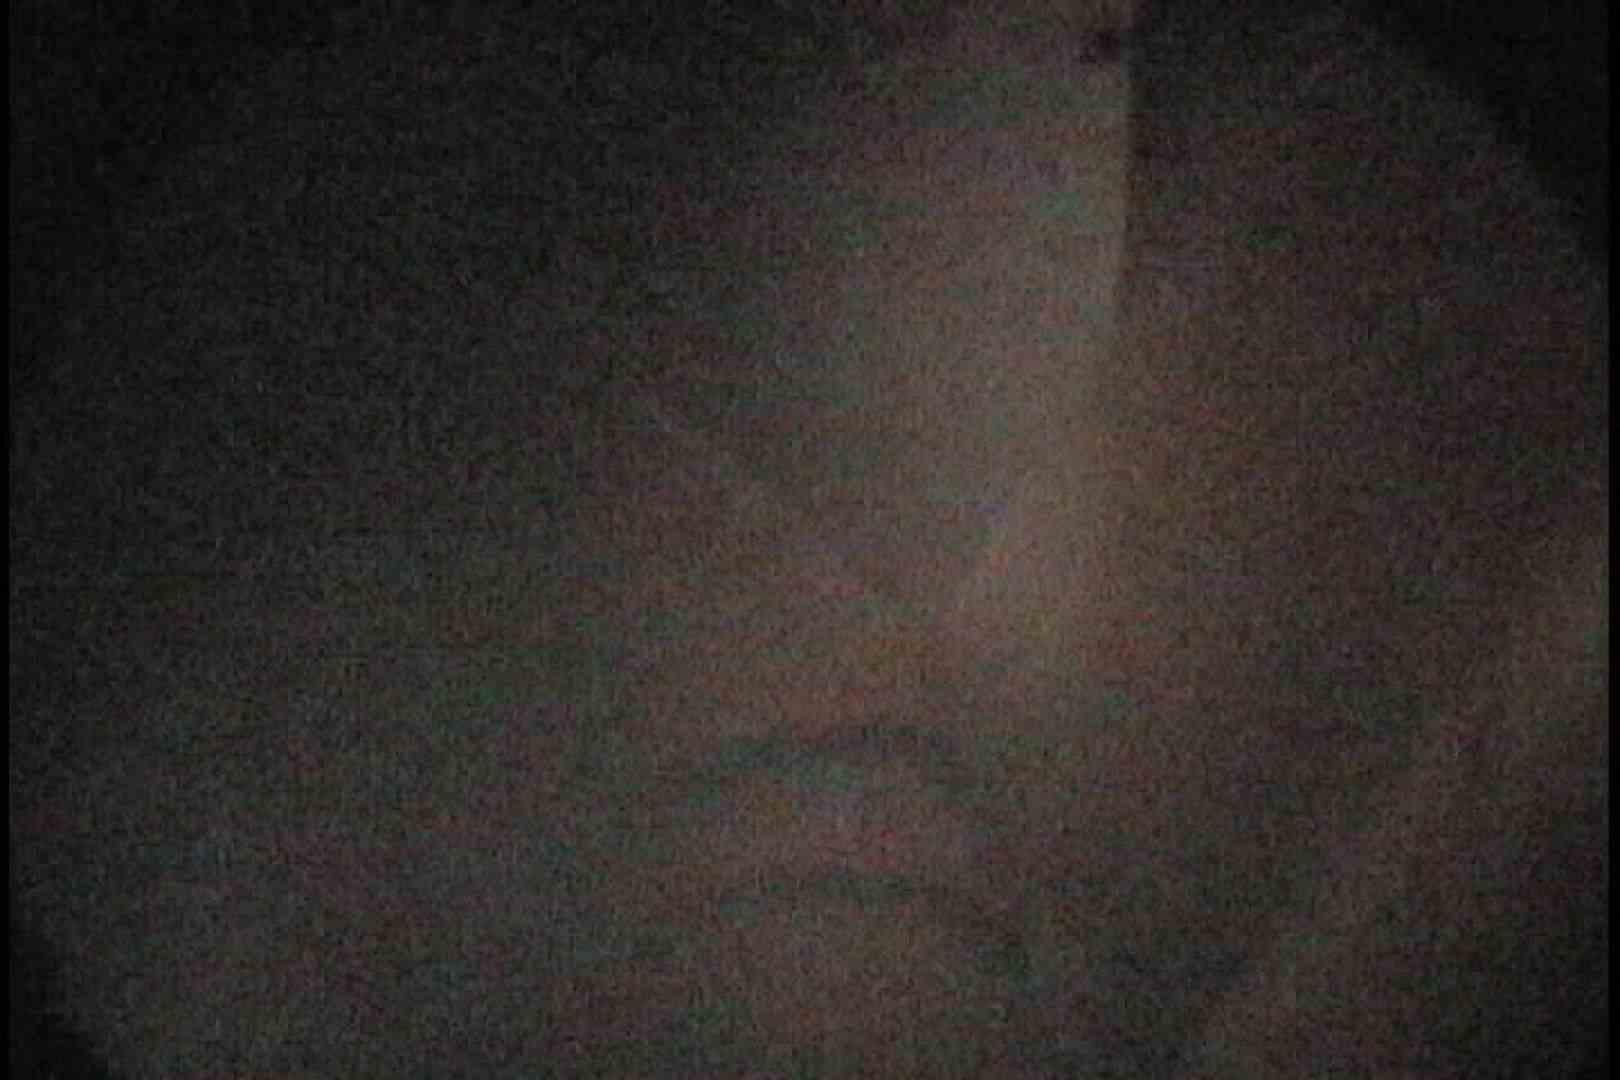 No.111  カメラに向けられる鋭い視線が! シャワー | 乙女  73pic 58